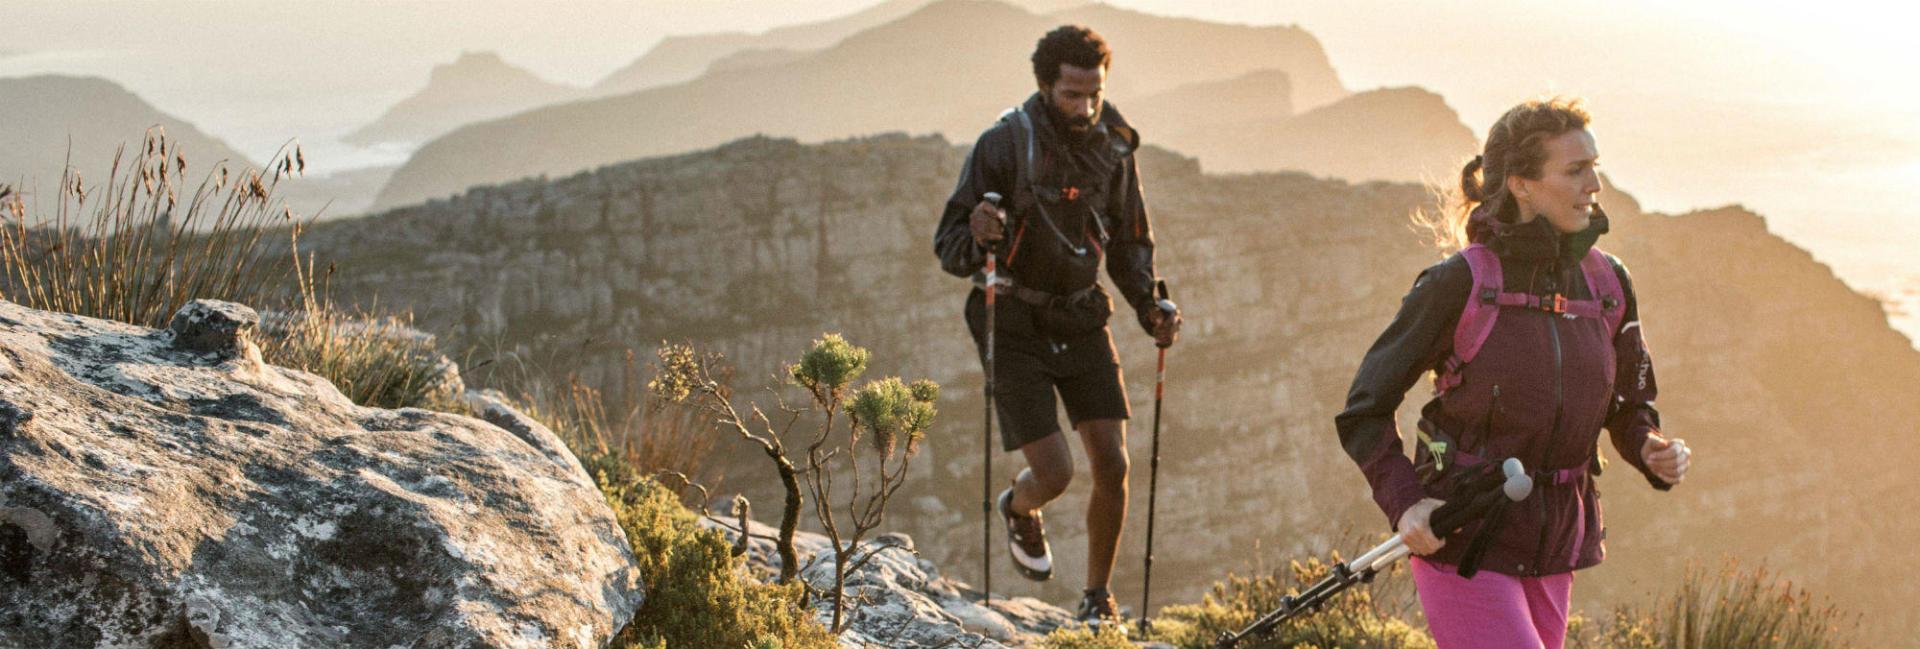 5 Reasons To Begin Speed Hiking